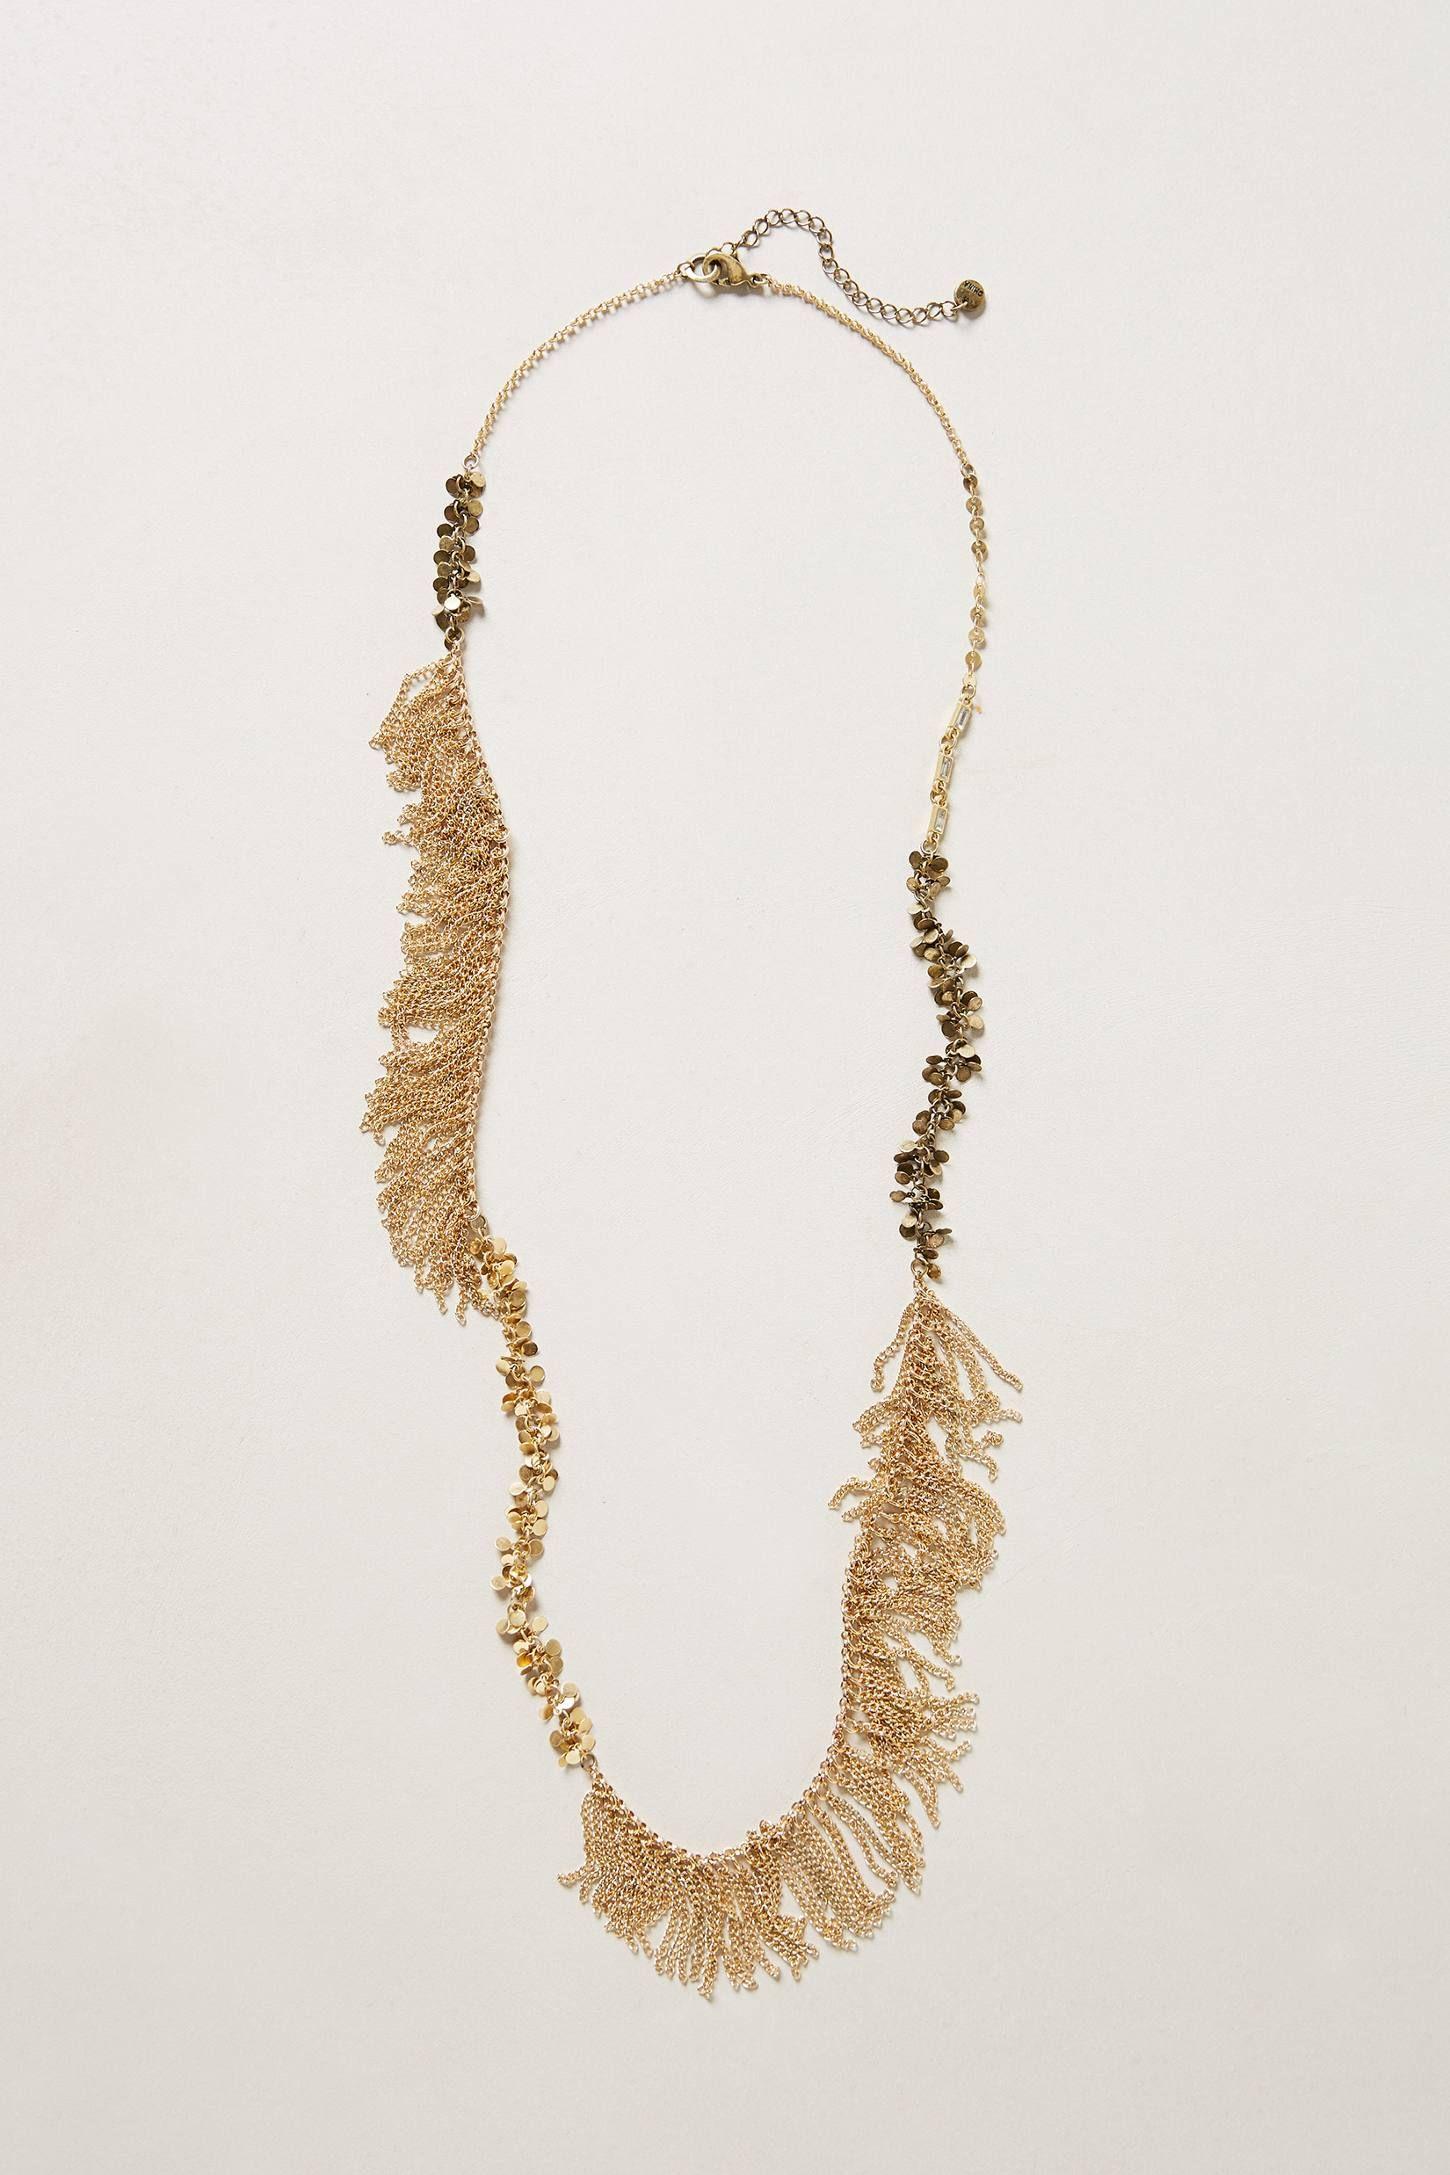 Saudades Fringe Necklace - anthropologie.com  #statementnecklace #saudades #fringe #necklace #anthropologie #boldaccessories